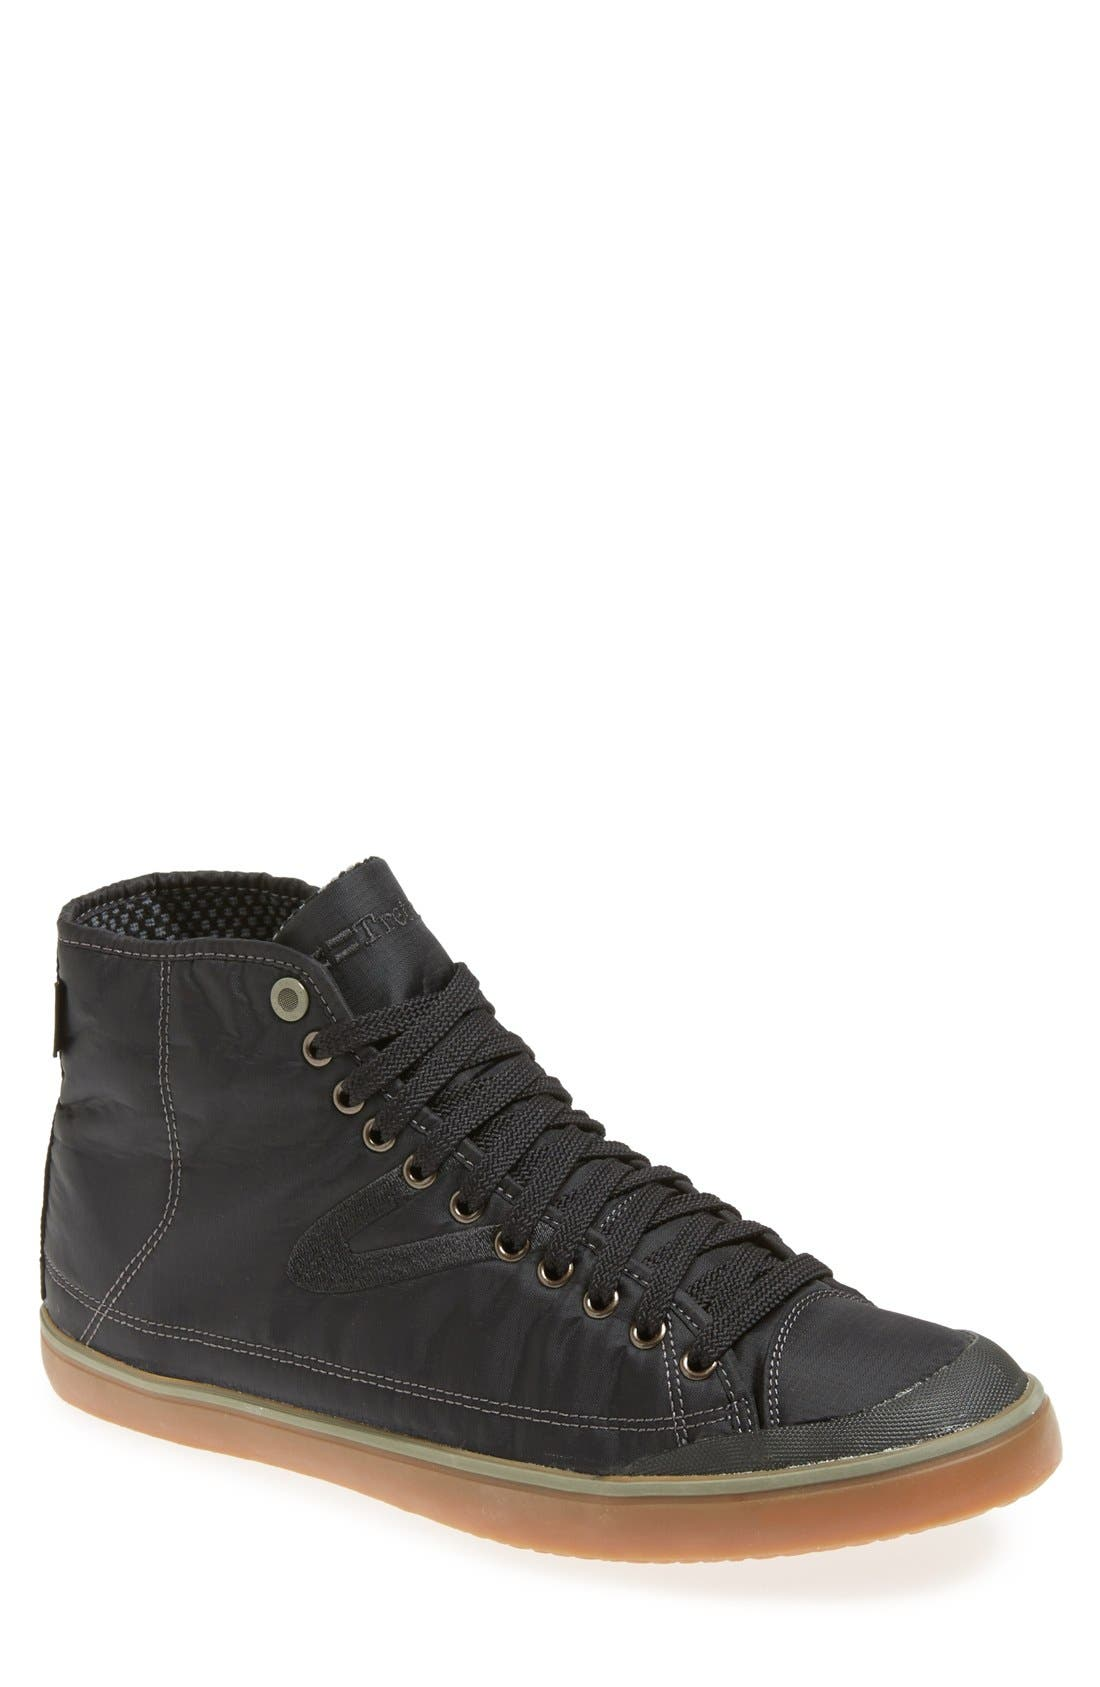 Main Image - Tretorn 'Skymra Mid SL GTX' Sneaker